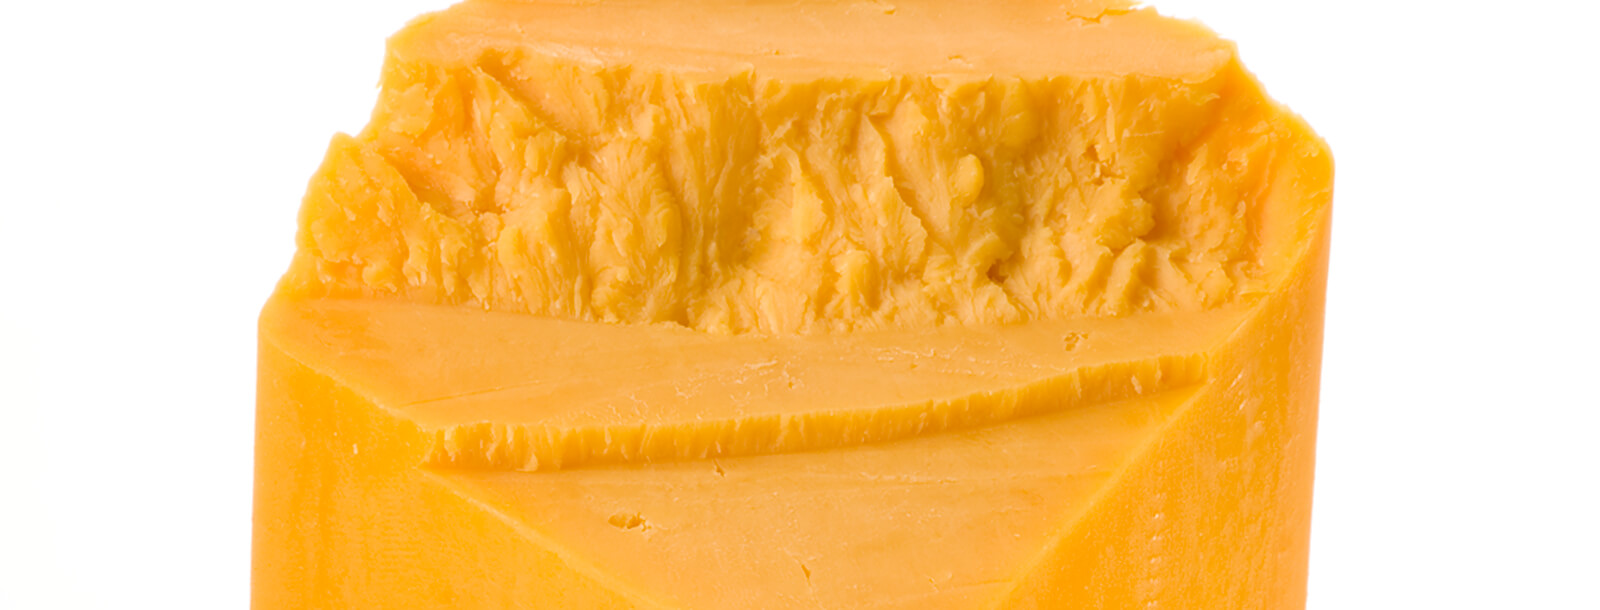 Platter of Cheddar